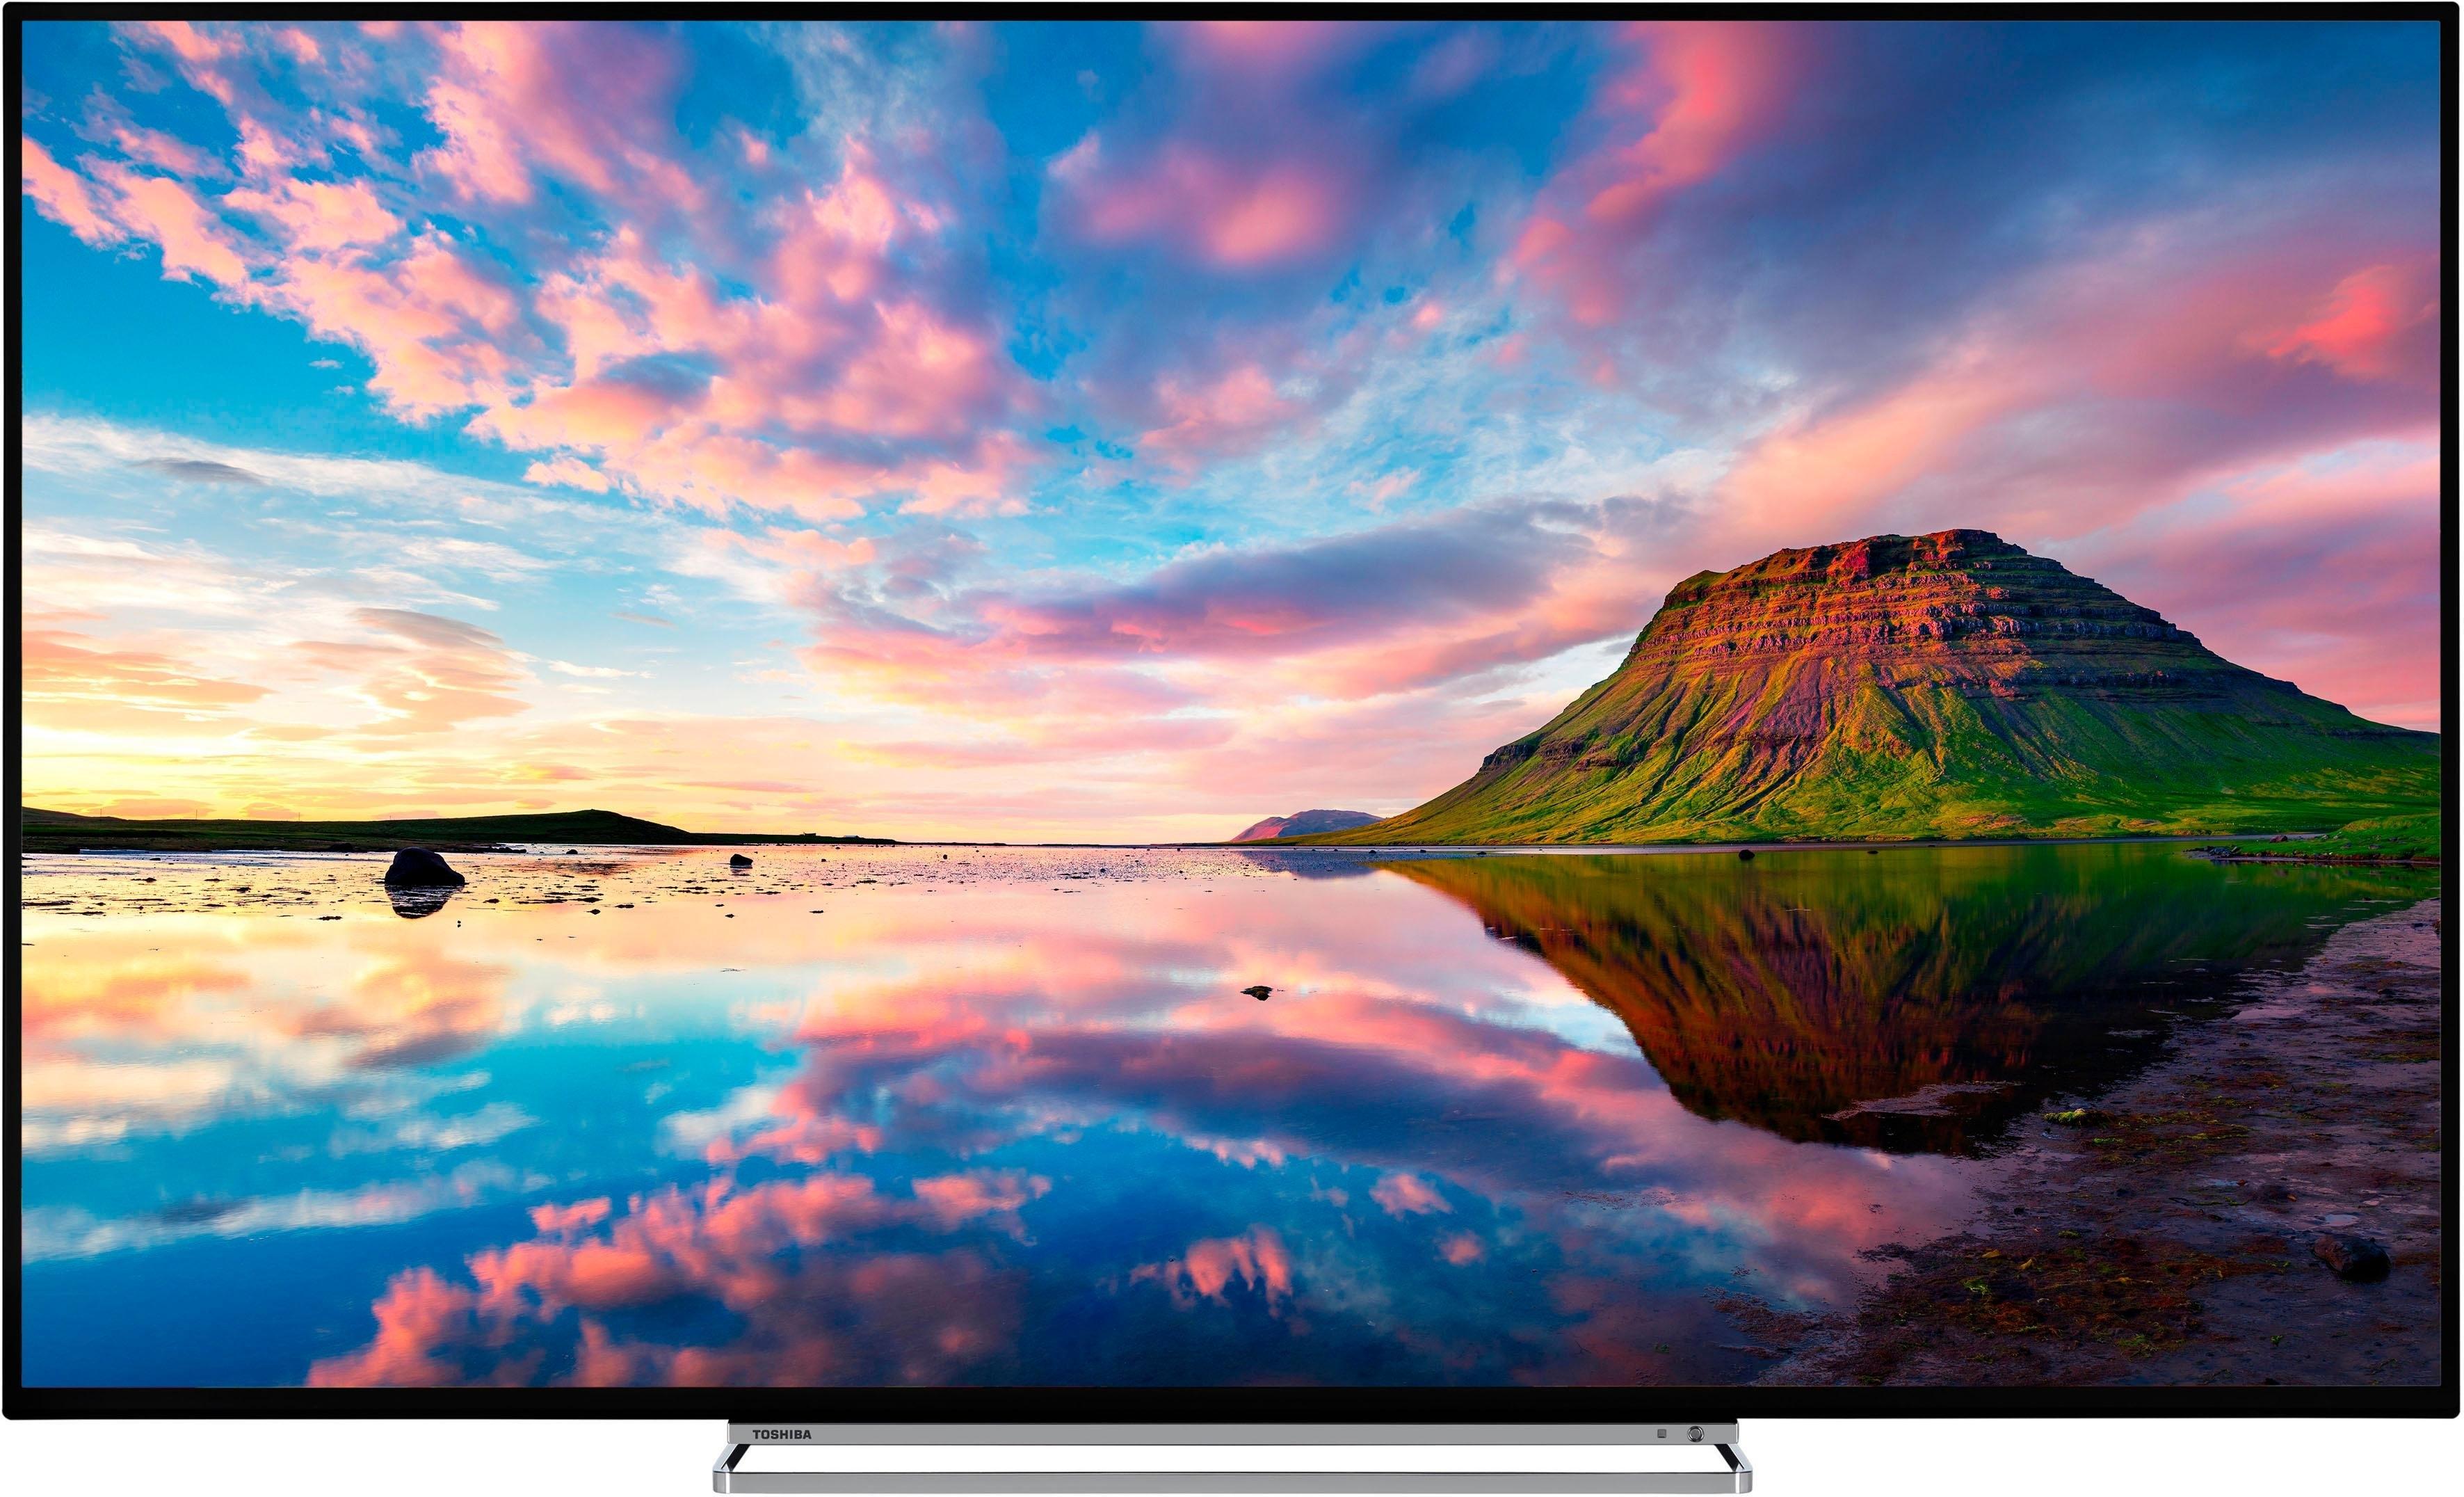 Toshiba 55U5863DA led-tv (140 cm (55 inch)), 4K Ultra HD, smart-tv in de webshop van OTTO kopen